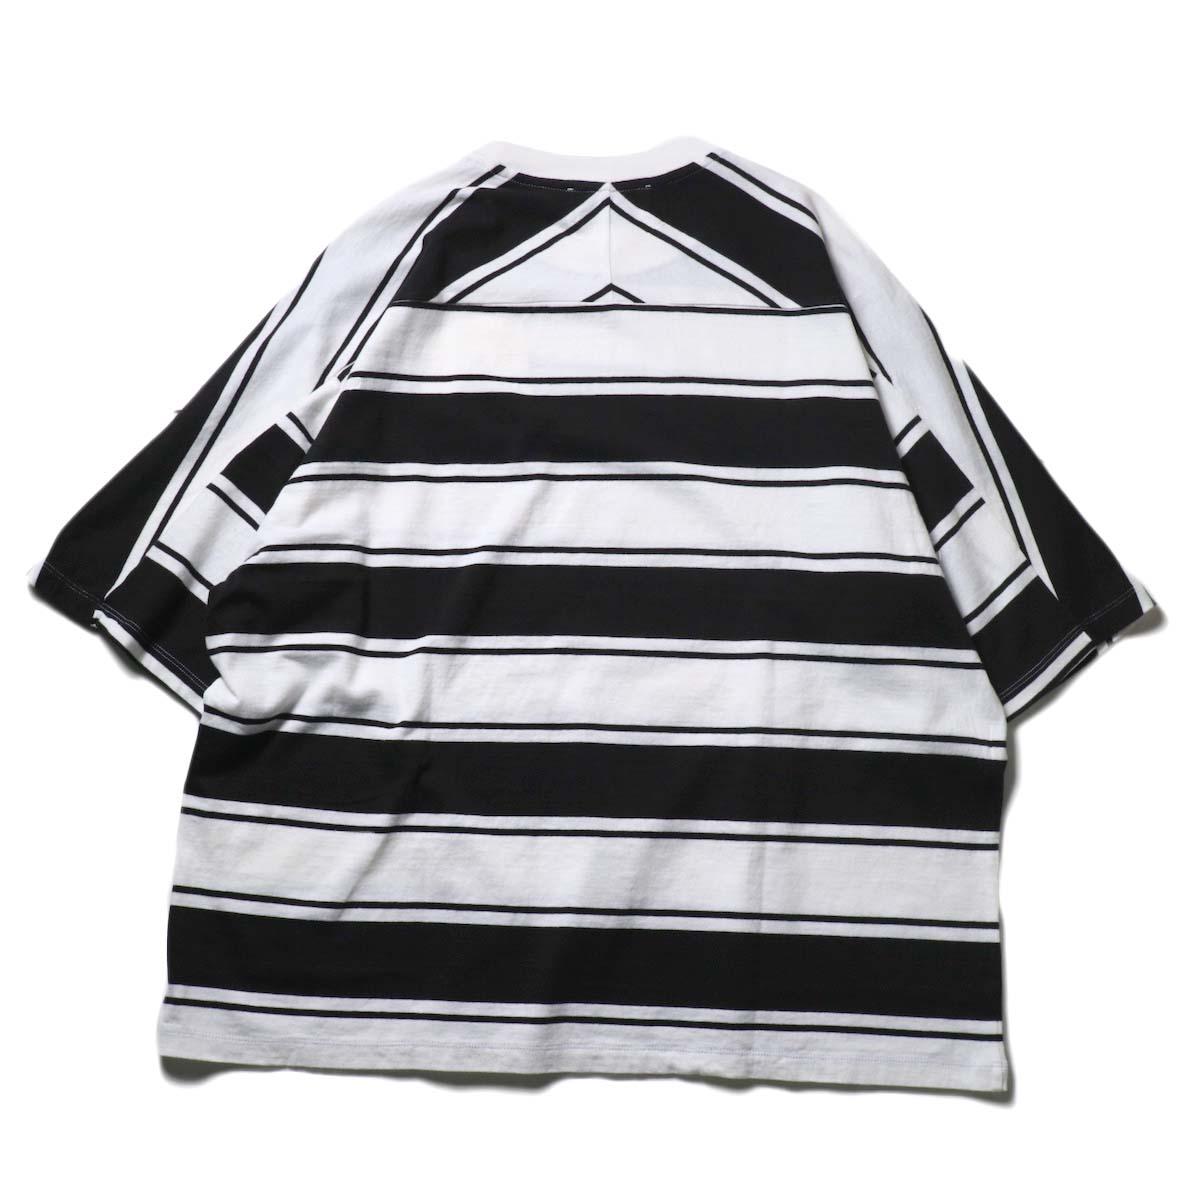 UNUSED / US1951 Dolman sleeve Short sleeve t-shirt (White×Black)背面